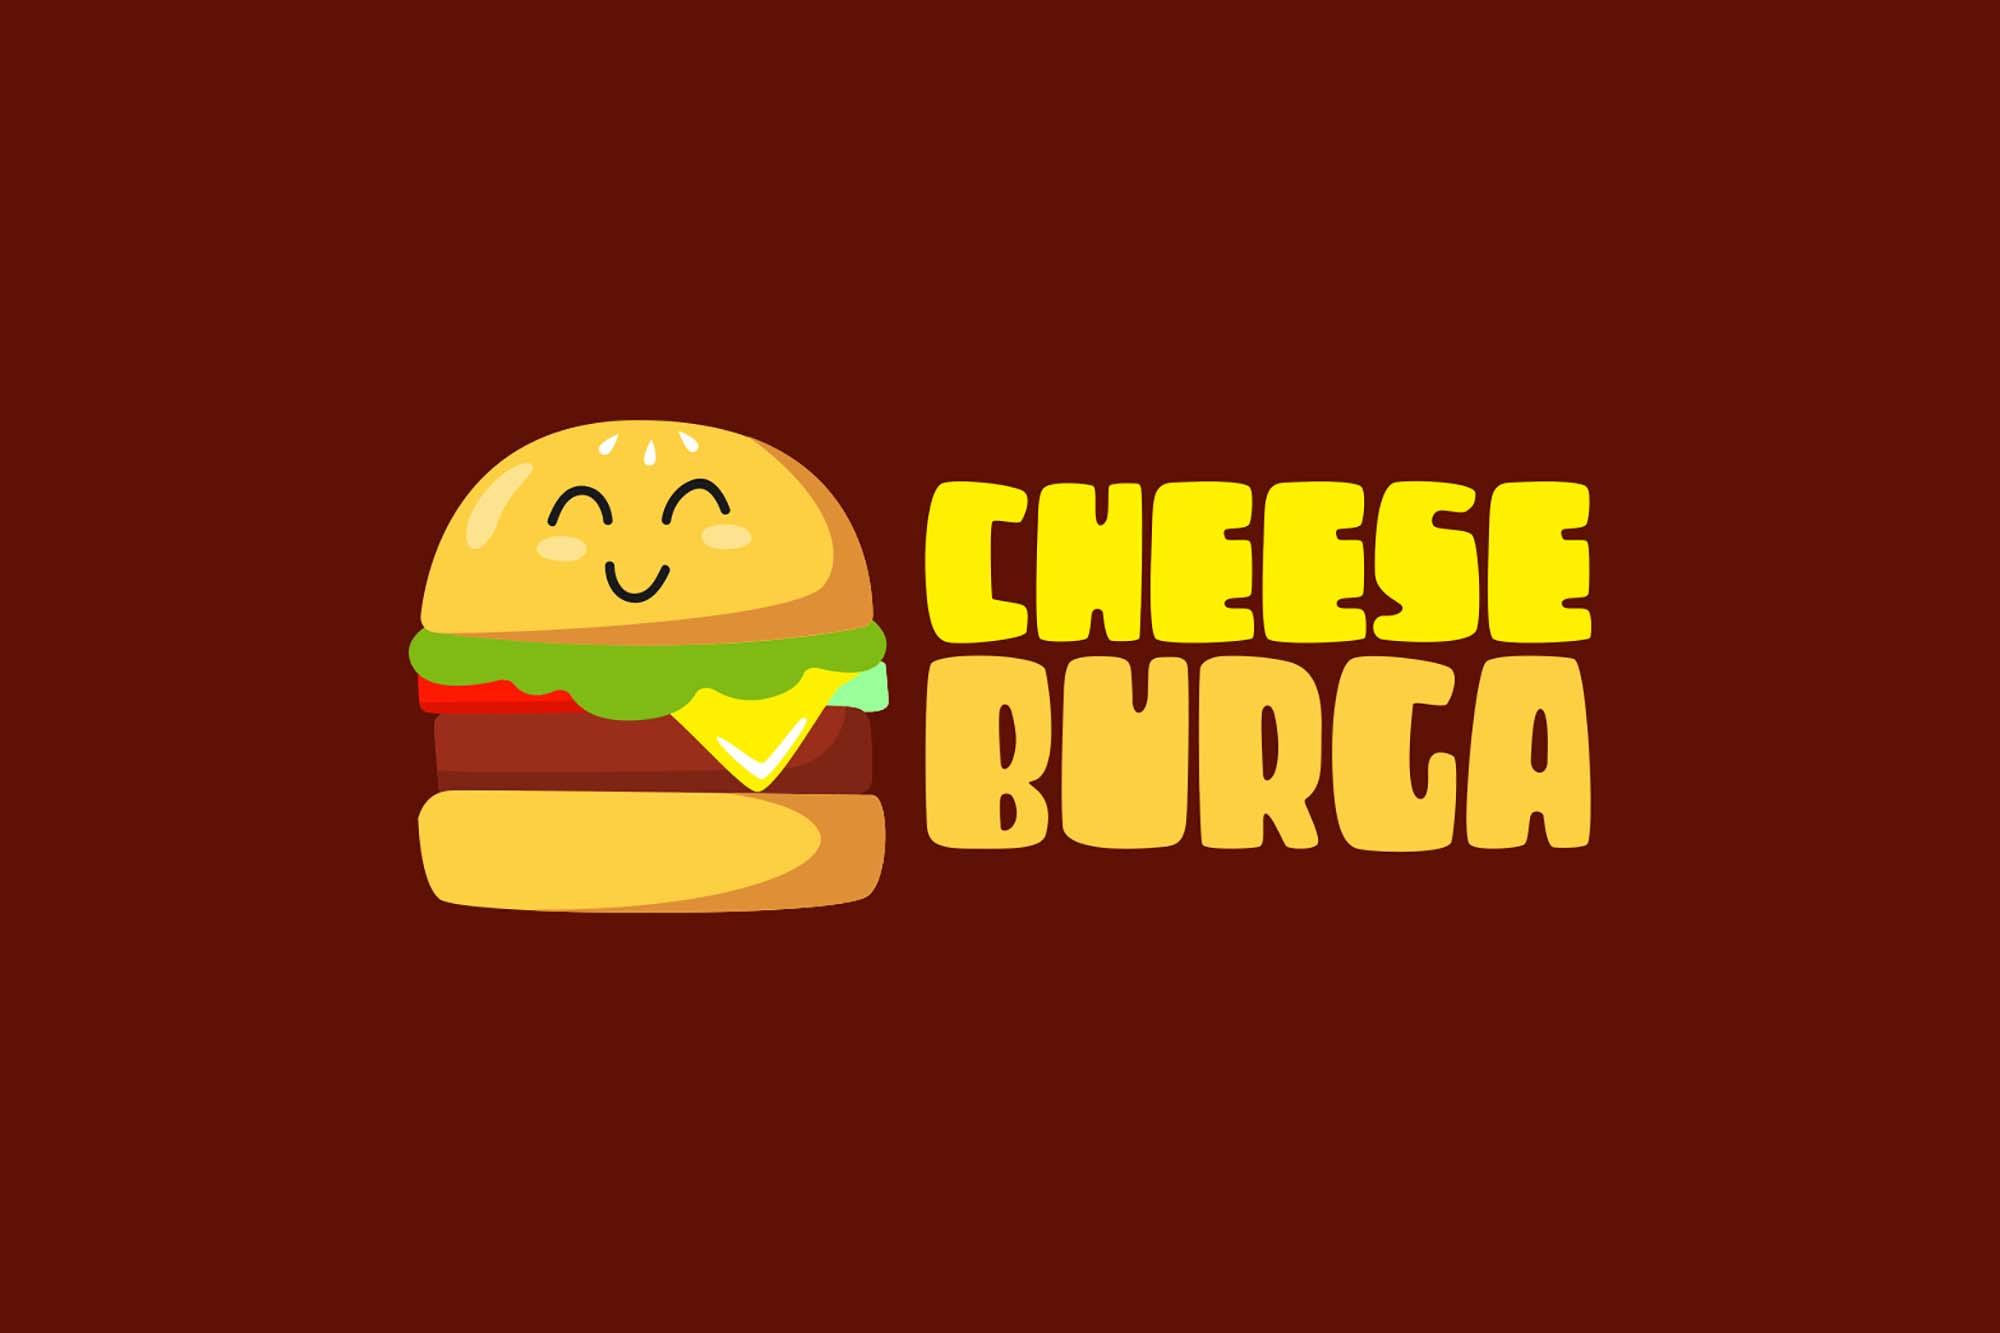 CheeseBurga Chubby Cute Font 4